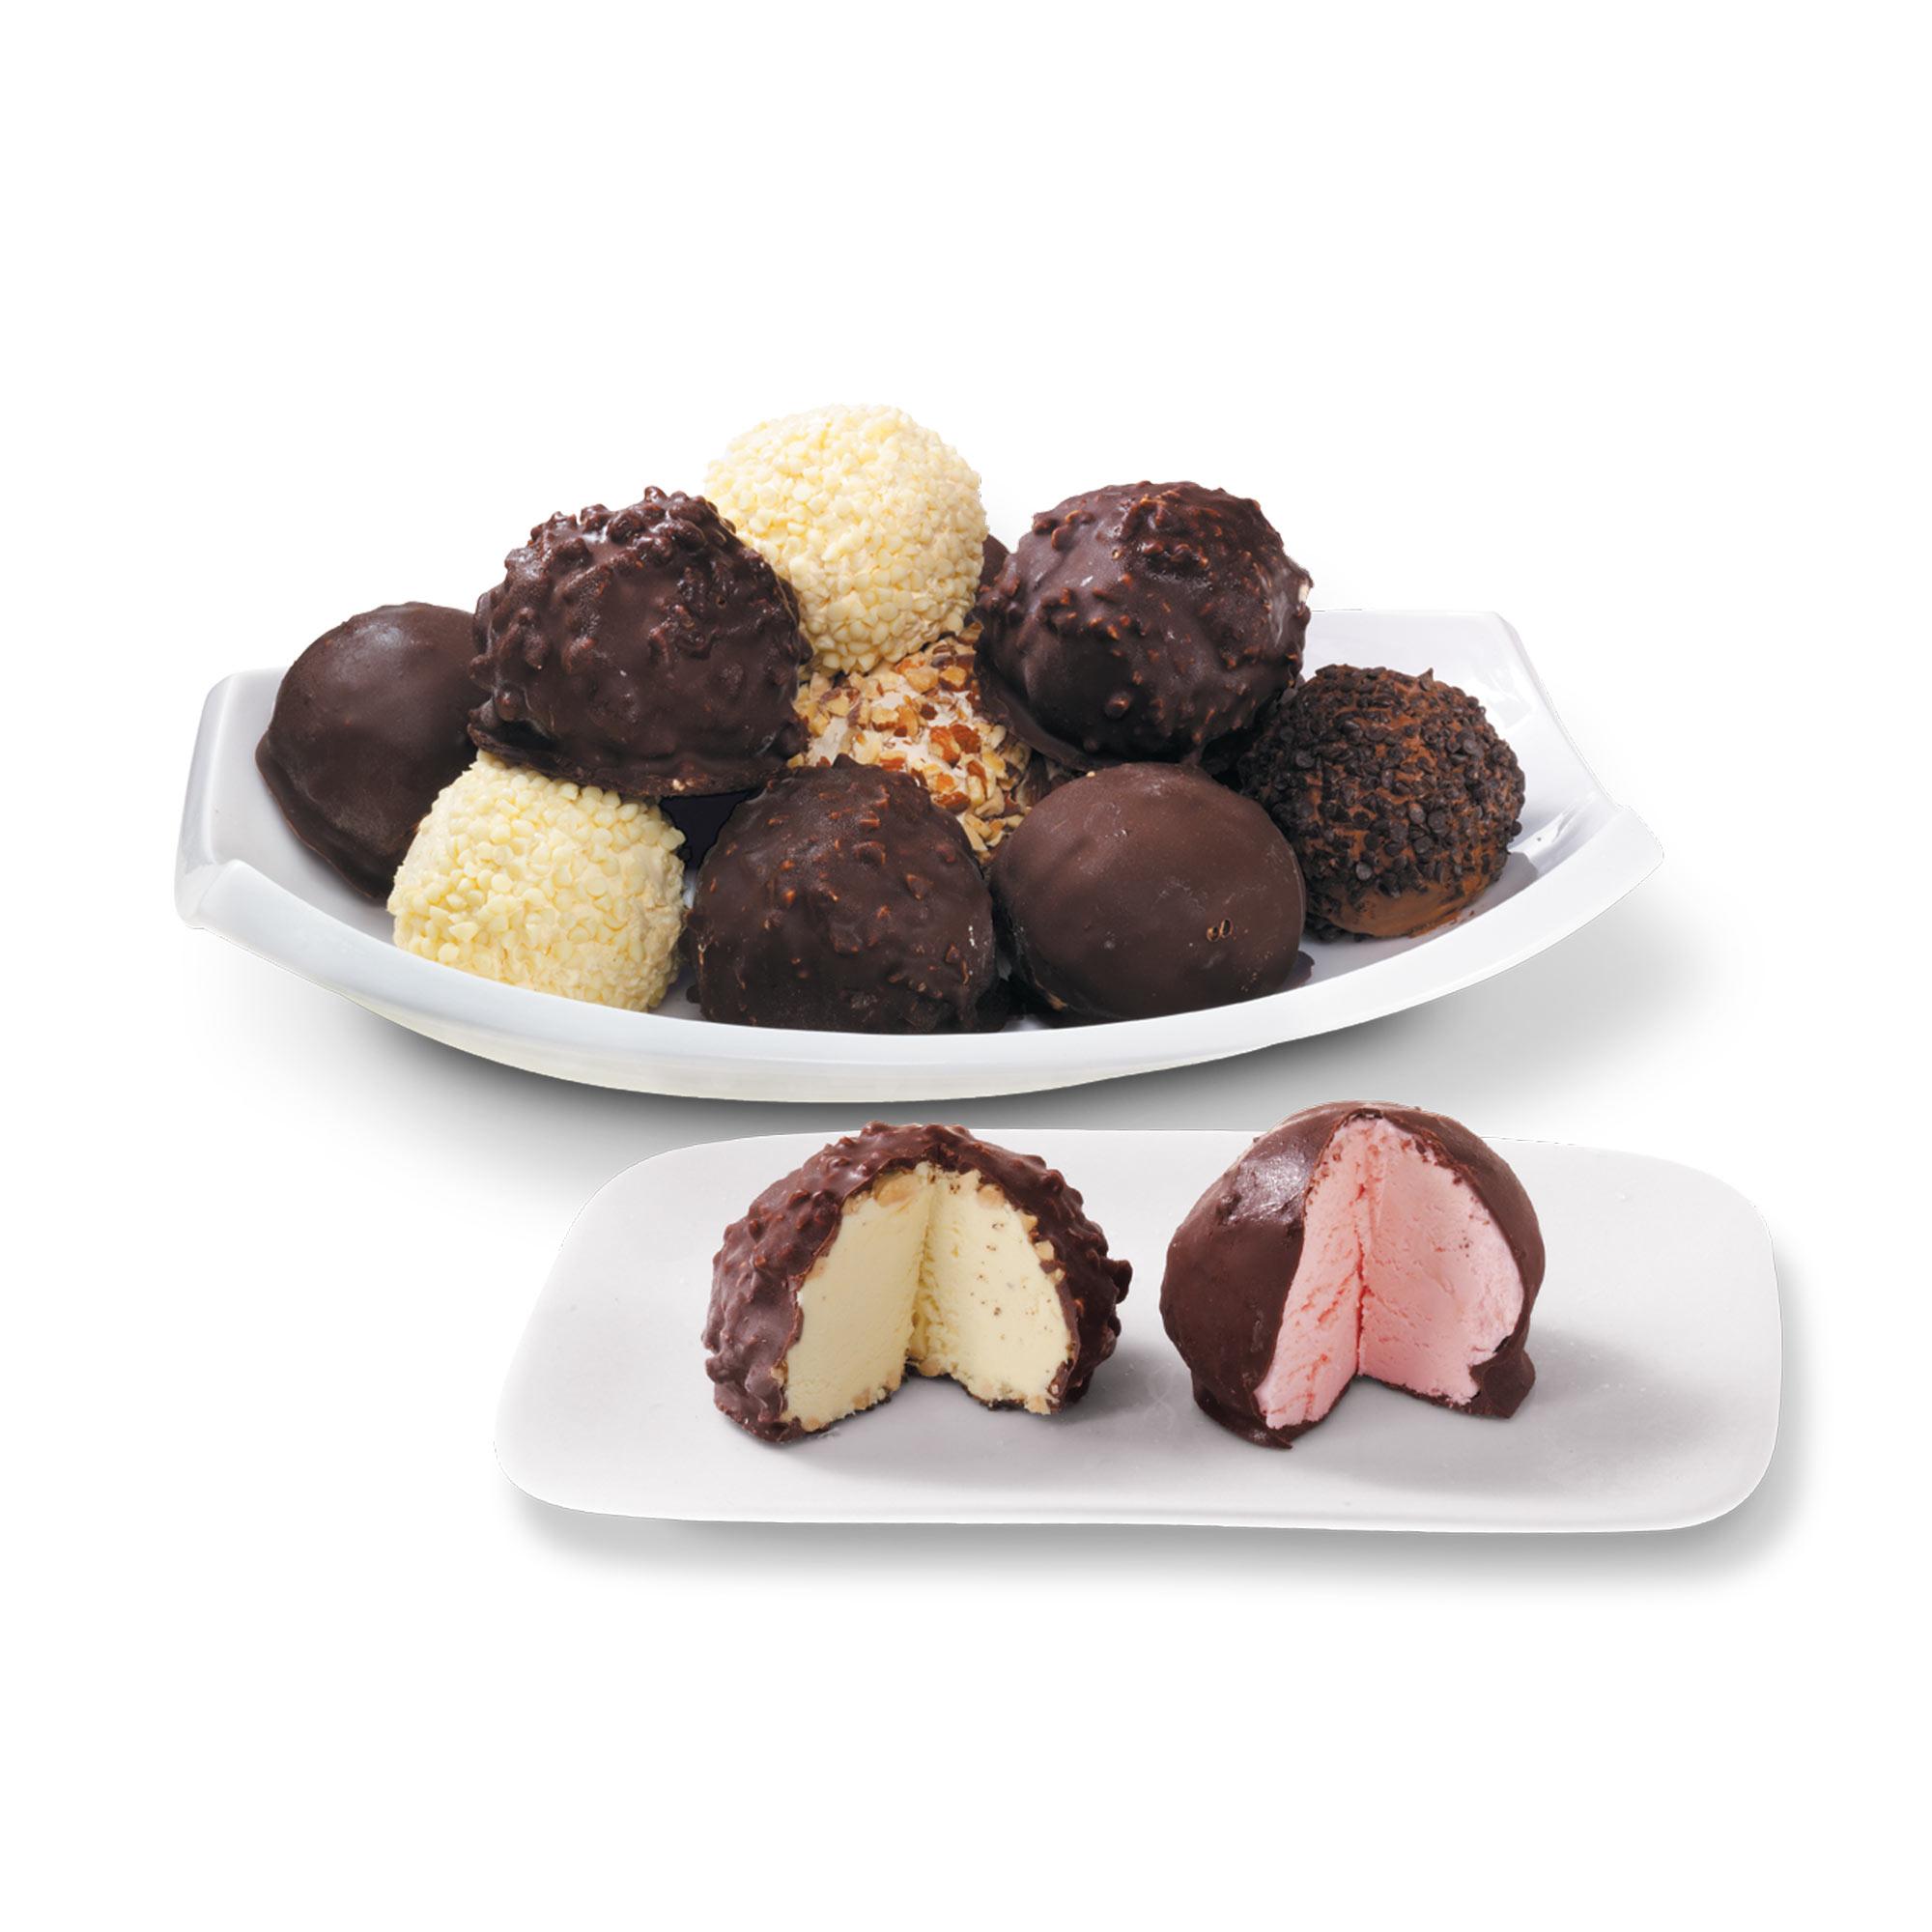 Italian Ice Cream Dessert Truffles | Hickory Farms